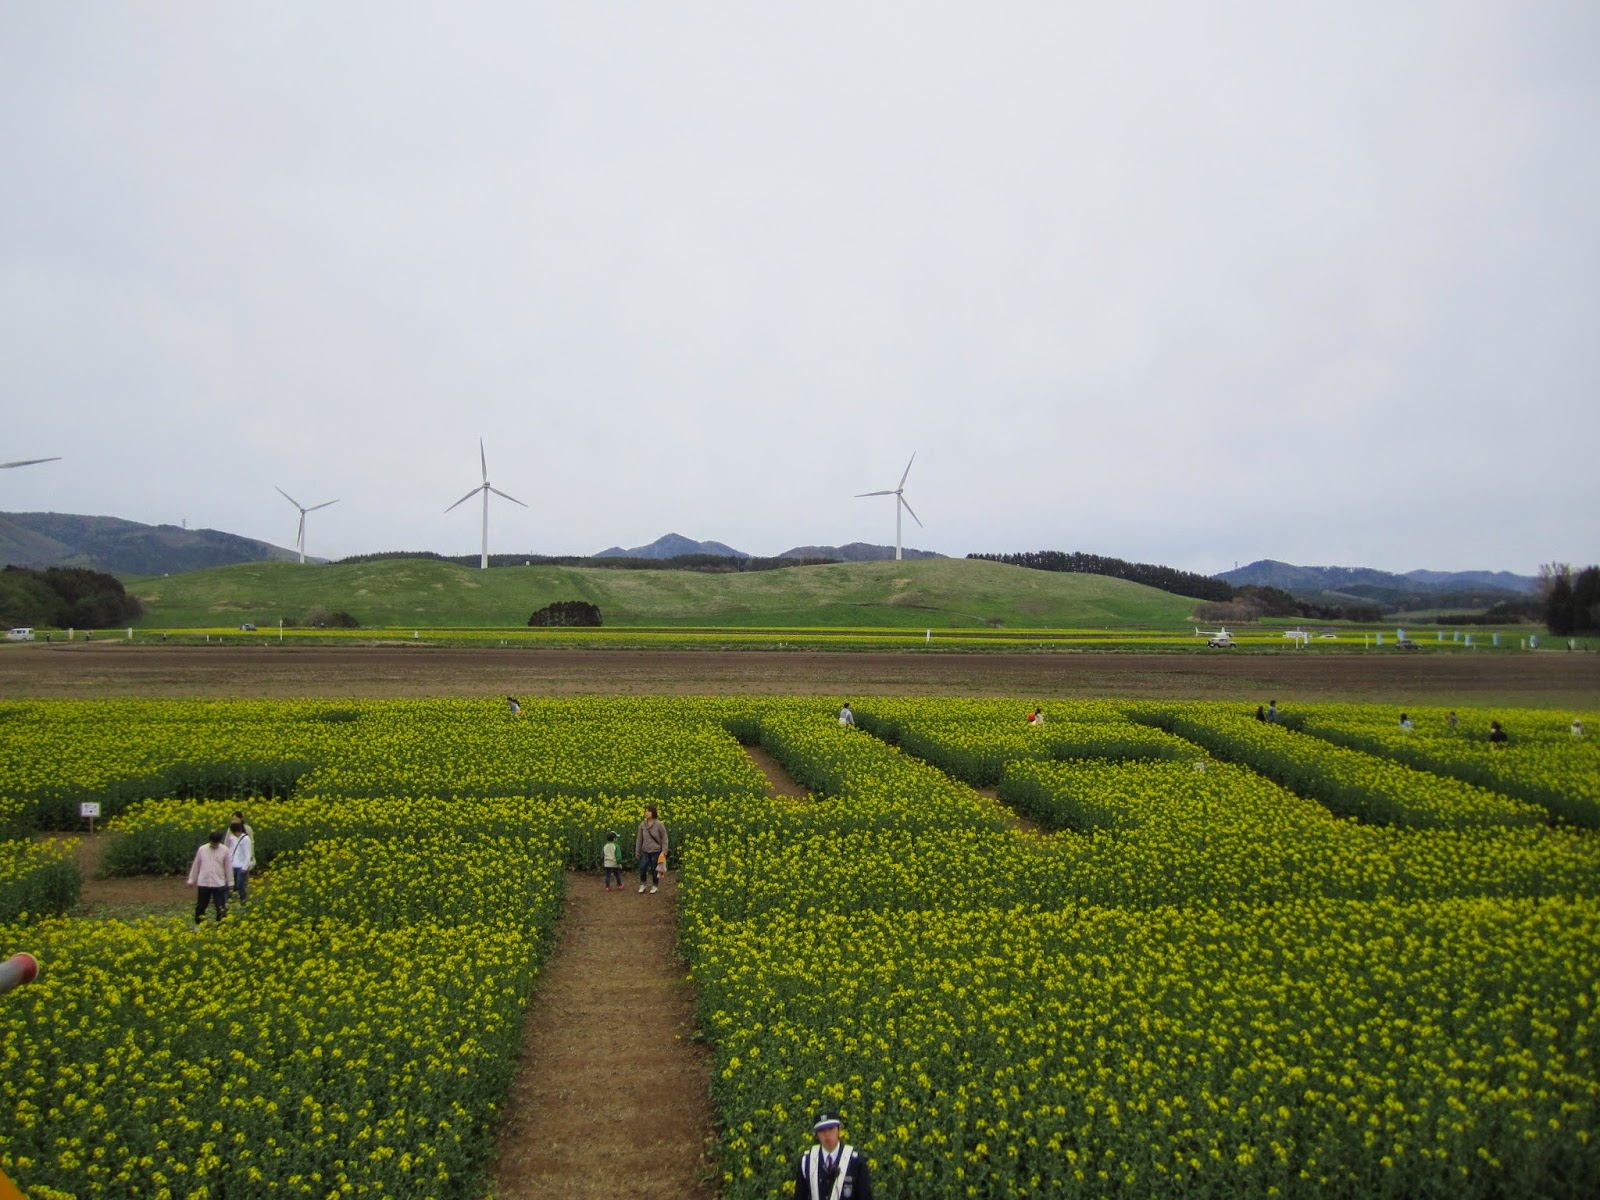 Canola Maze (2013 Canola Festival in Yokohama) 菜の花大迷路 2014菜の花フェスティバルinよこはま